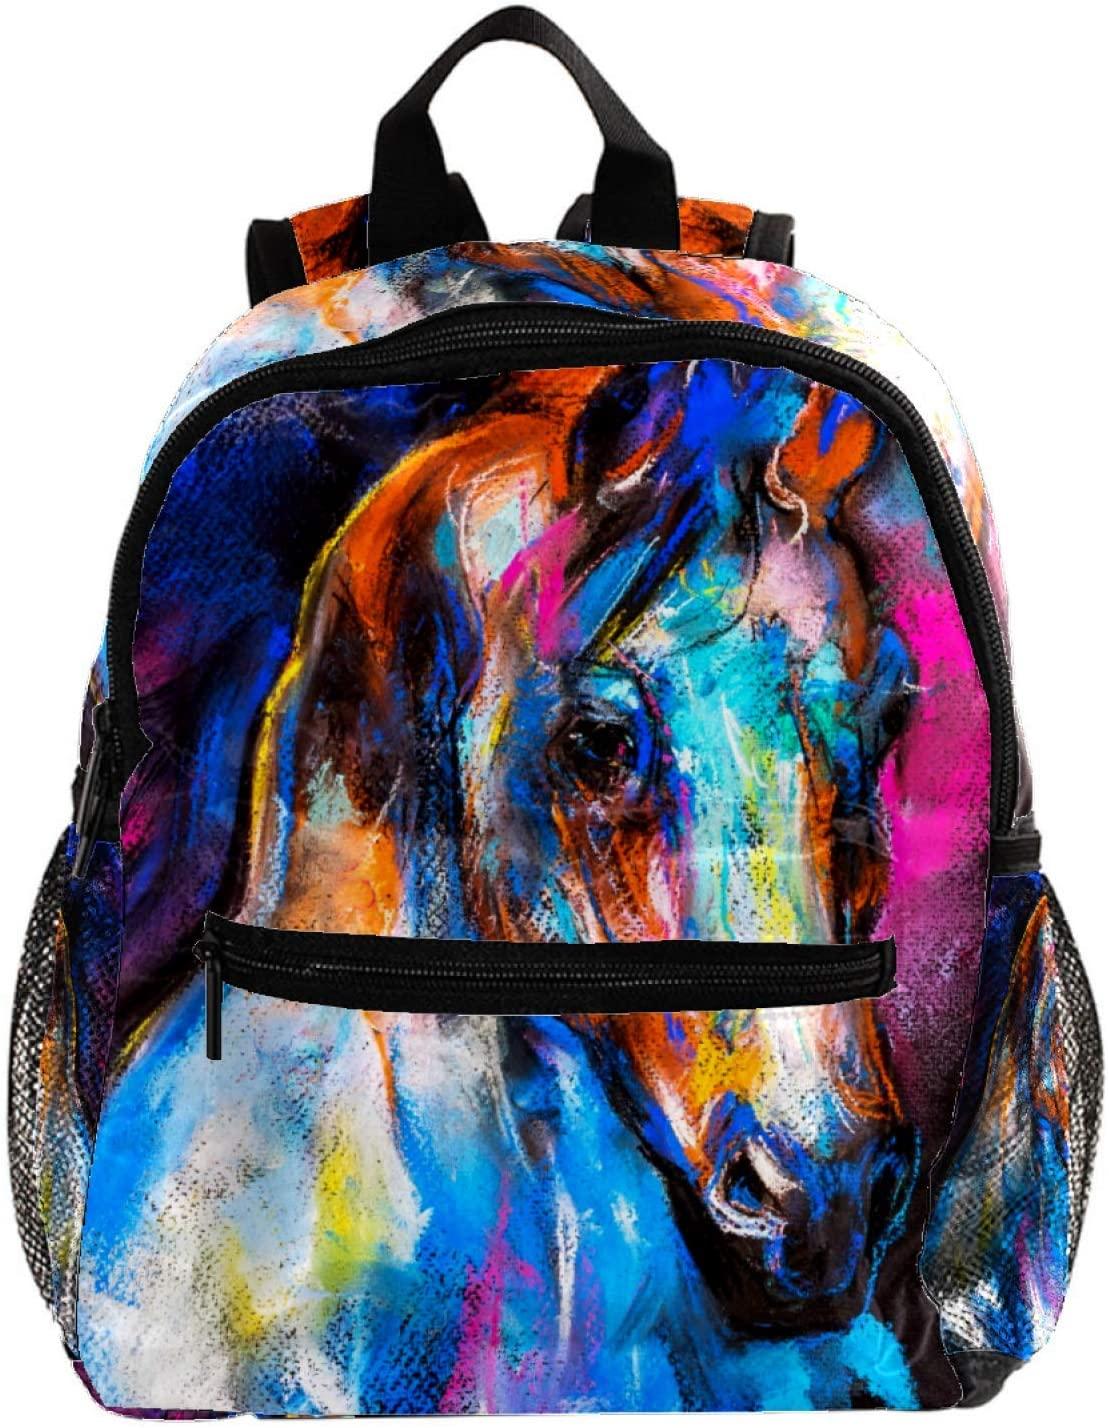 Backpack For Kids Colorful Watercolor Horse Preschool Backpack Little Kids Dackpack